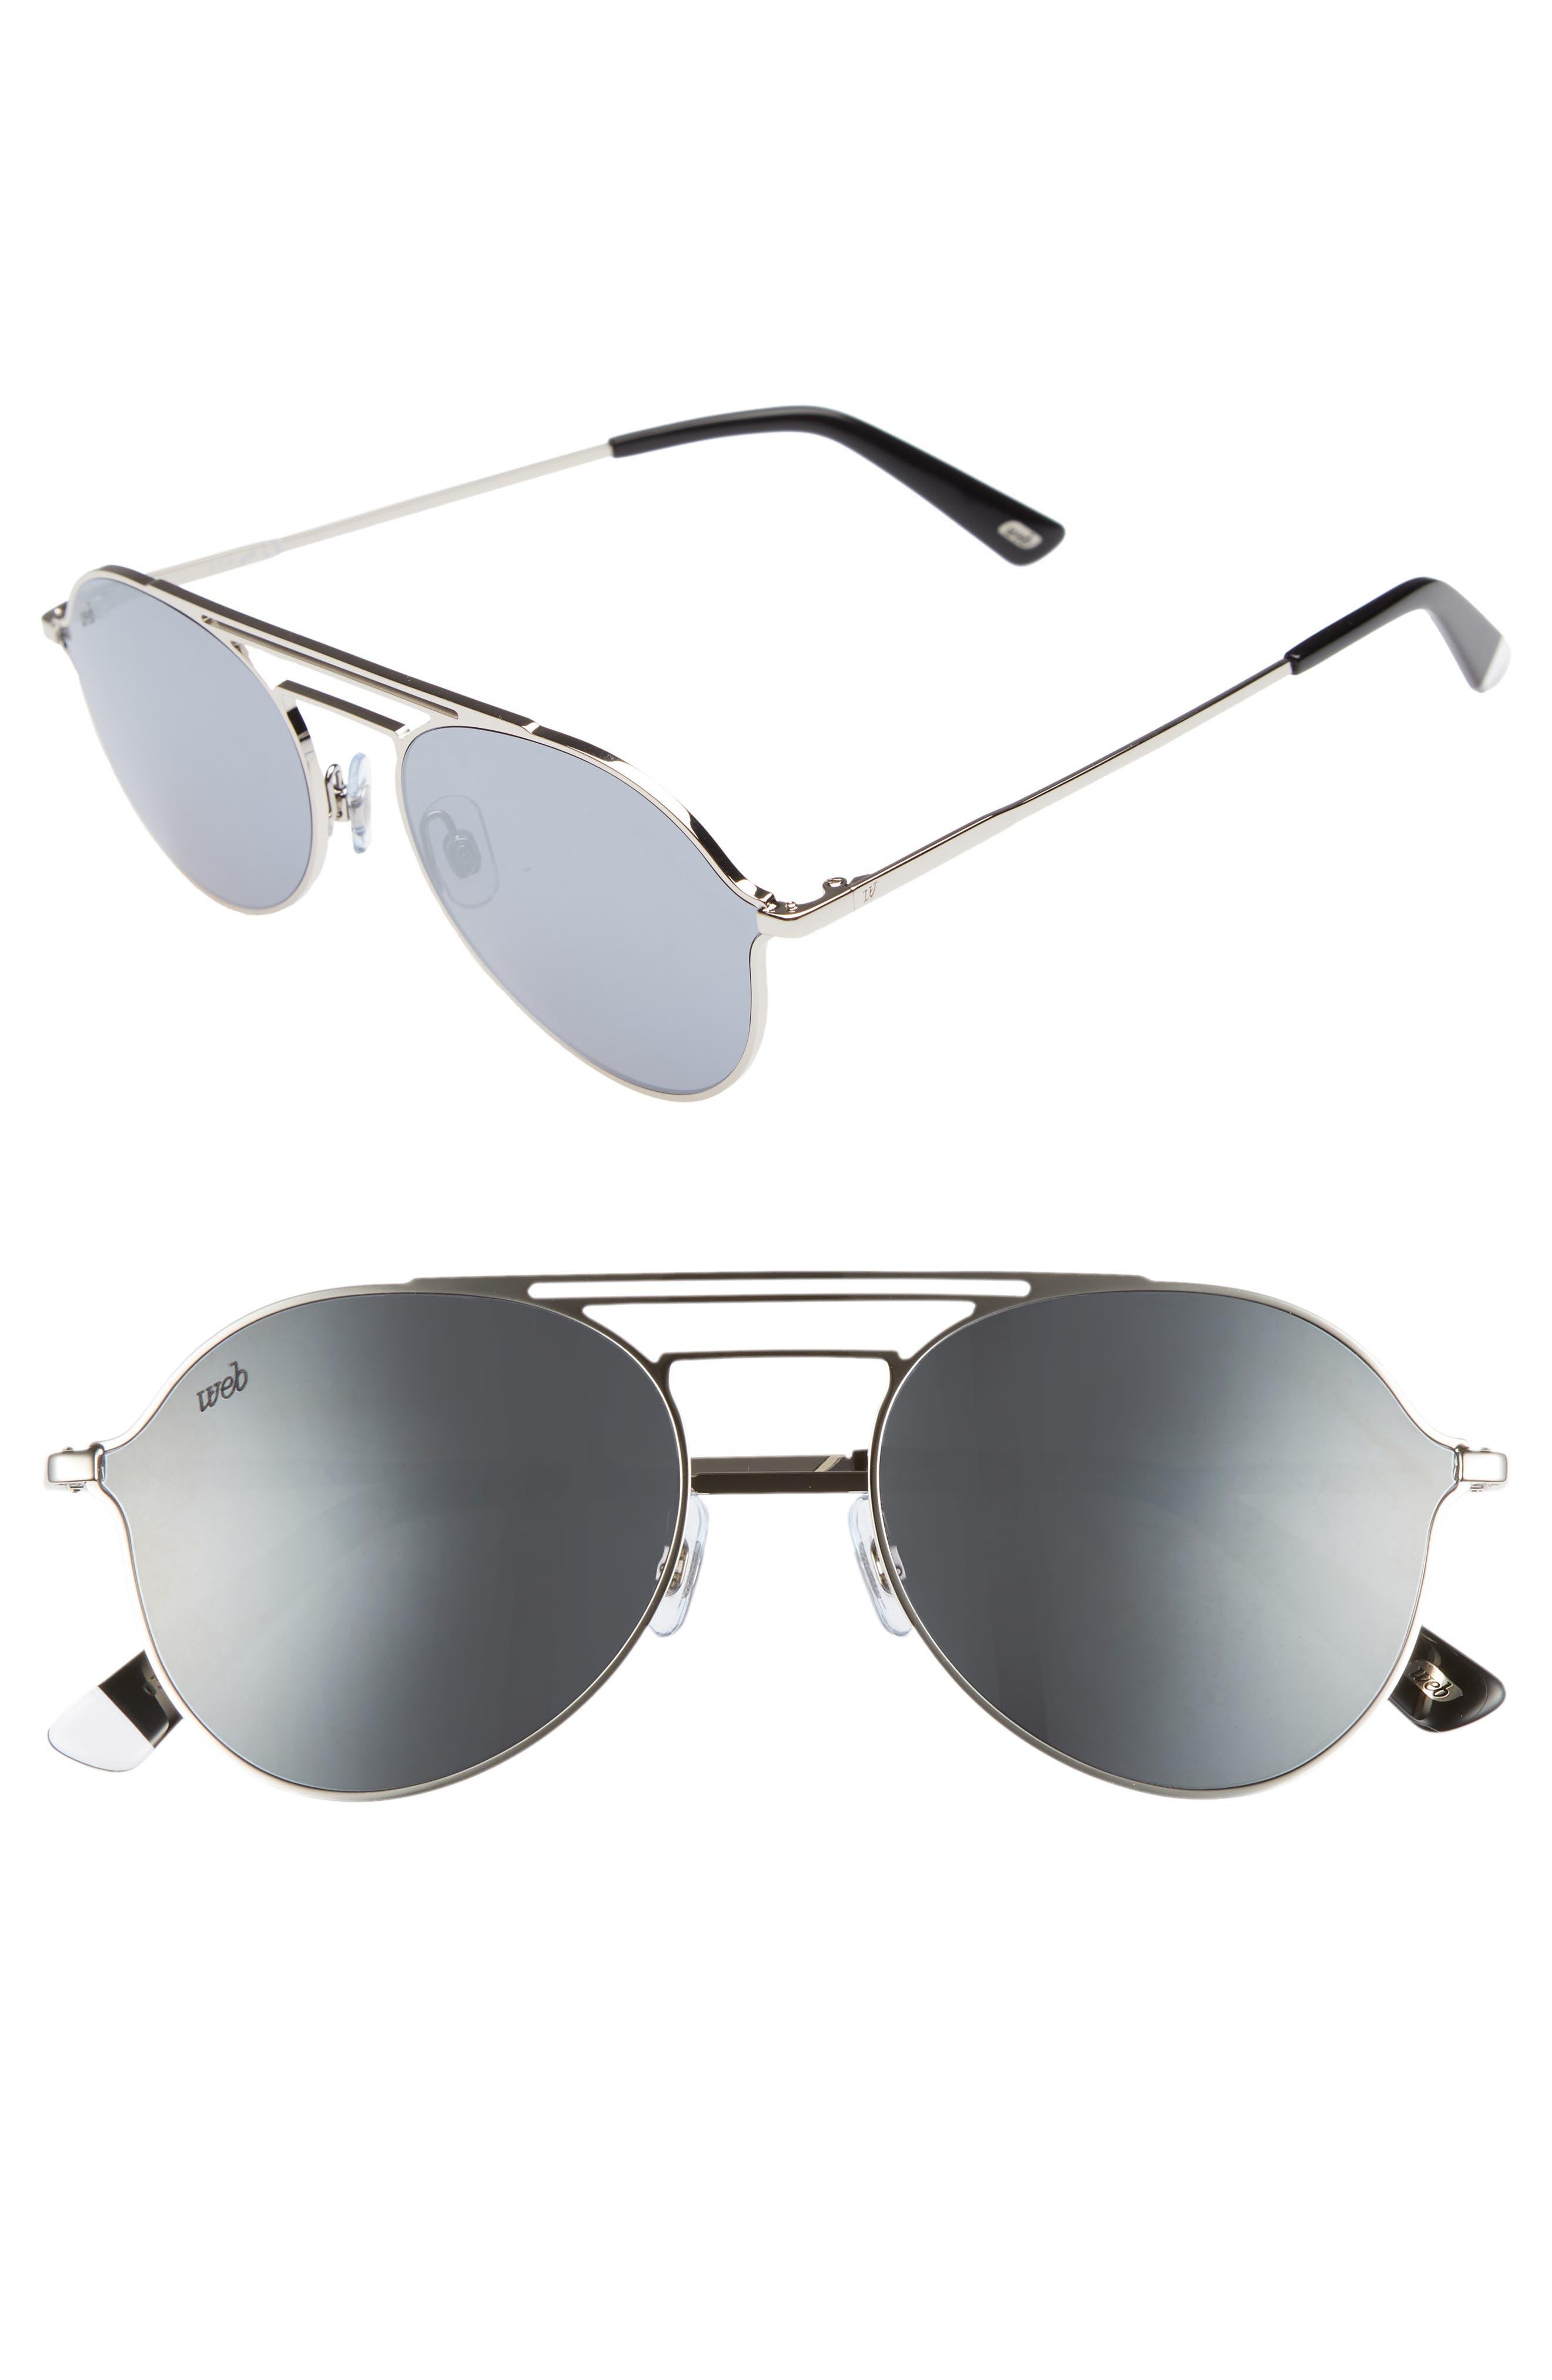 56mm Aviator Sunglasses,                         Main,                         color, Shiny Palladium/ Smoke Mirror